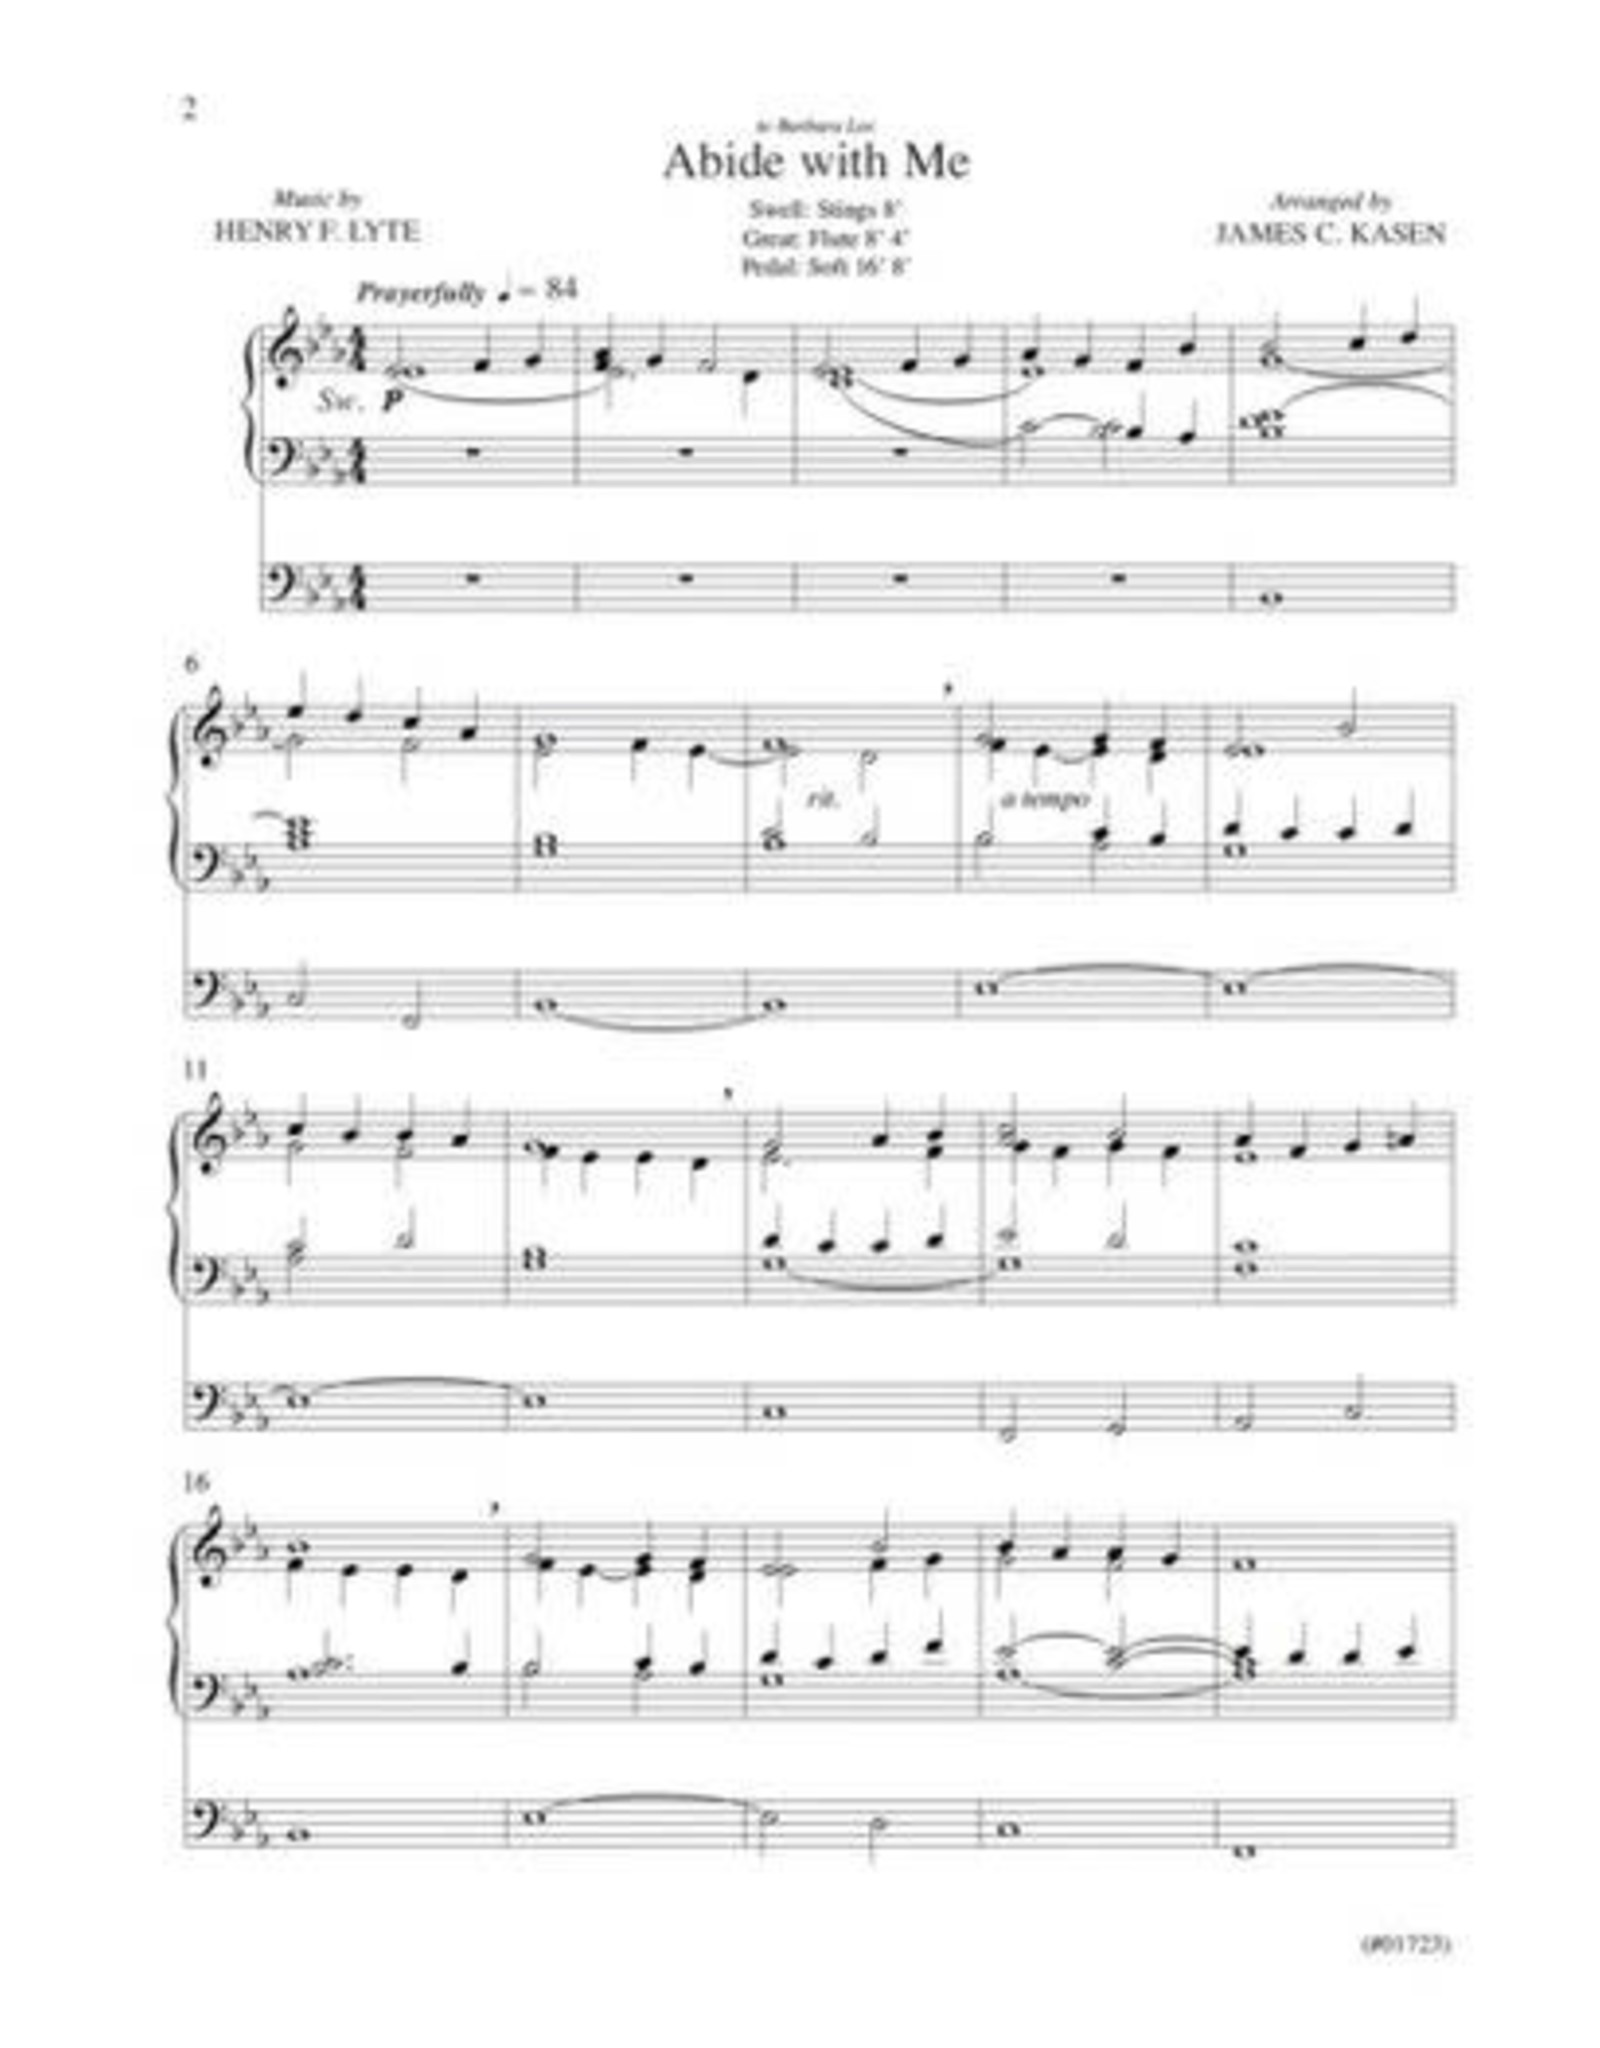 Jackman Music Organ Postludes for Church Services Vol. 3 arr. James C. Kasen